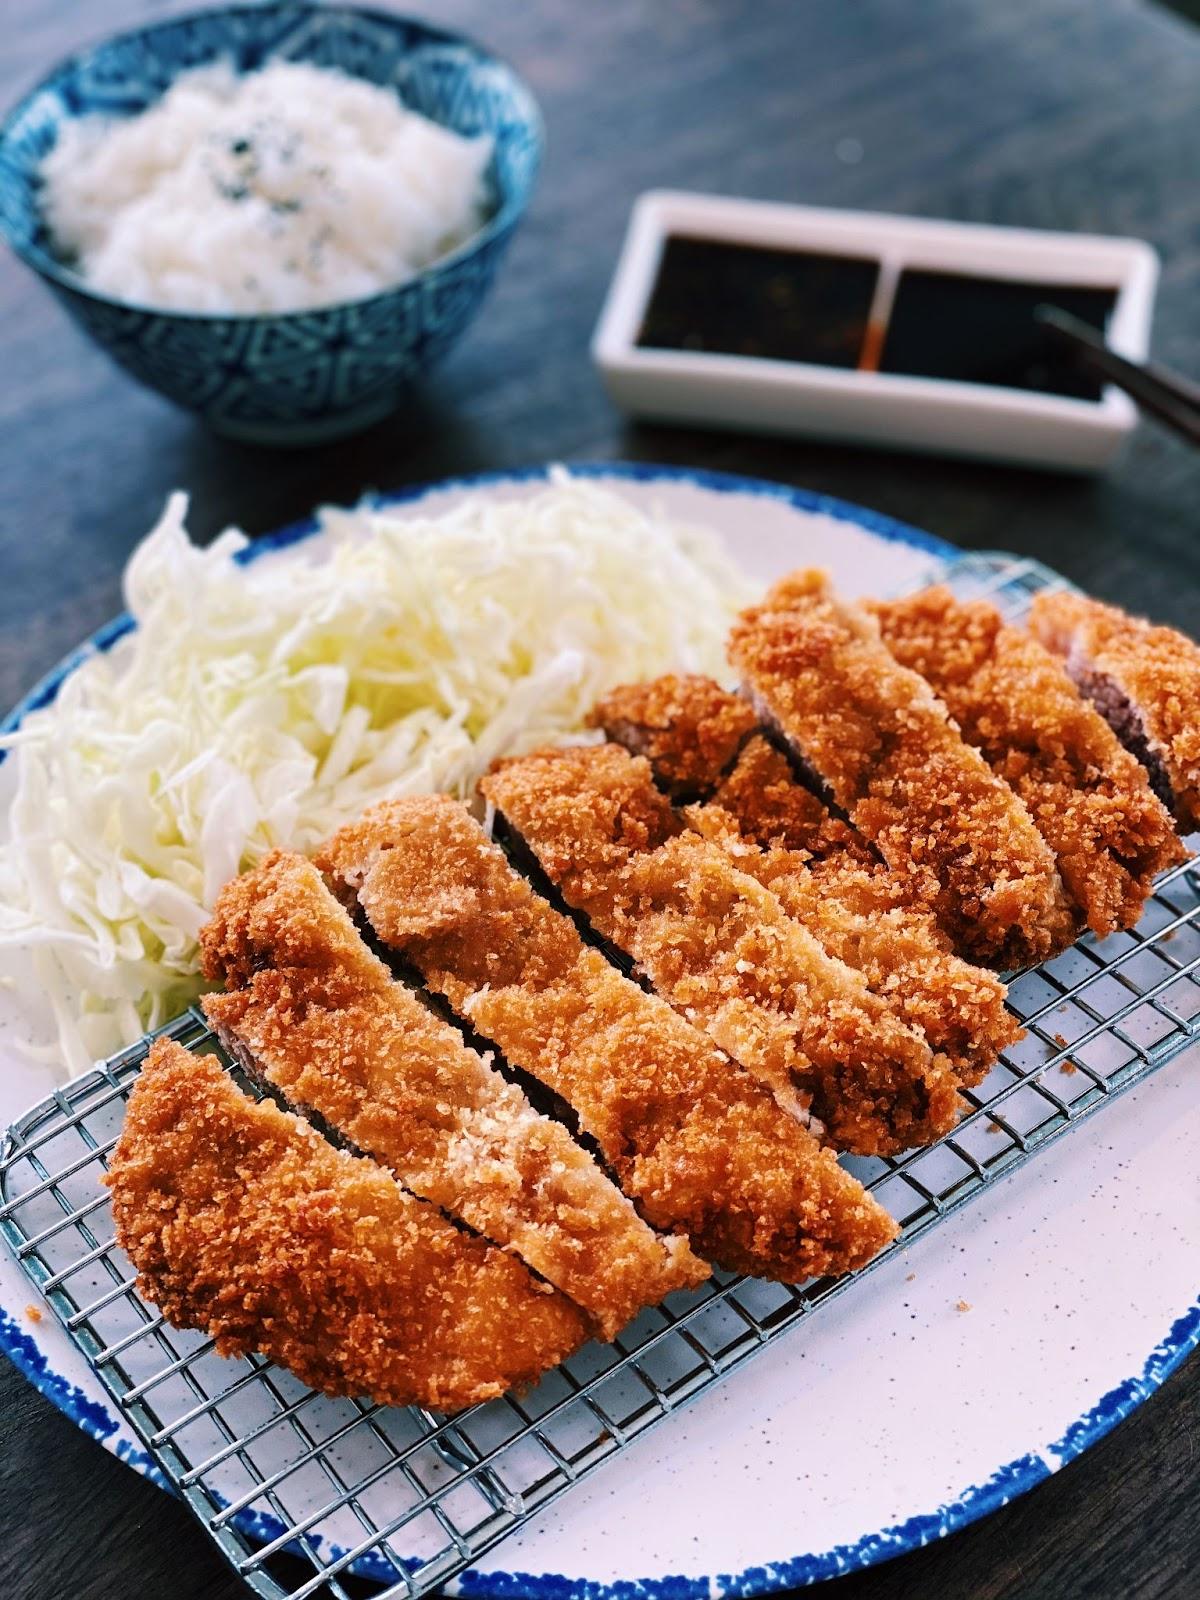 Tonkatsu - Japanese Fried Pork Chops (CRISPY & CRUNCHY)